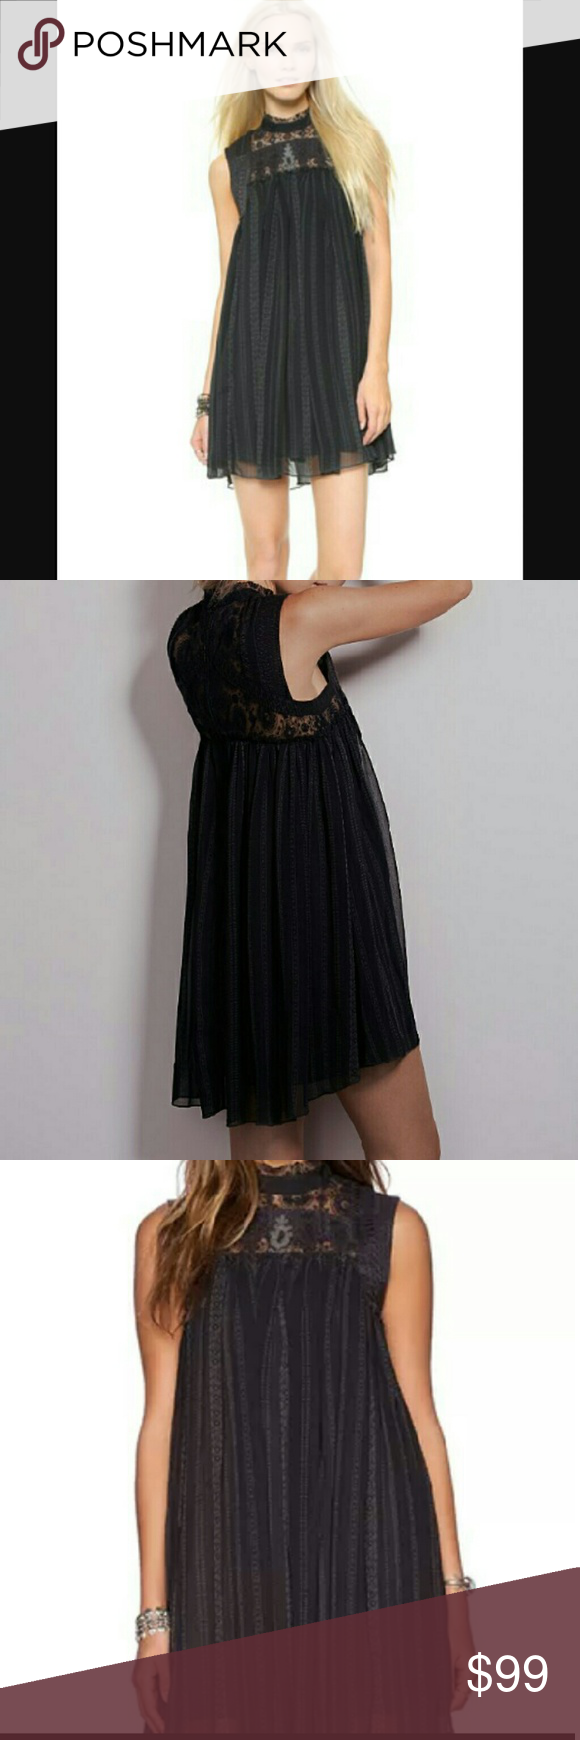 Free People Black Penny Georgette Babylon Dress L Dresses Free People Dress Clothes Design [ 1740 x 580 Pixel ]